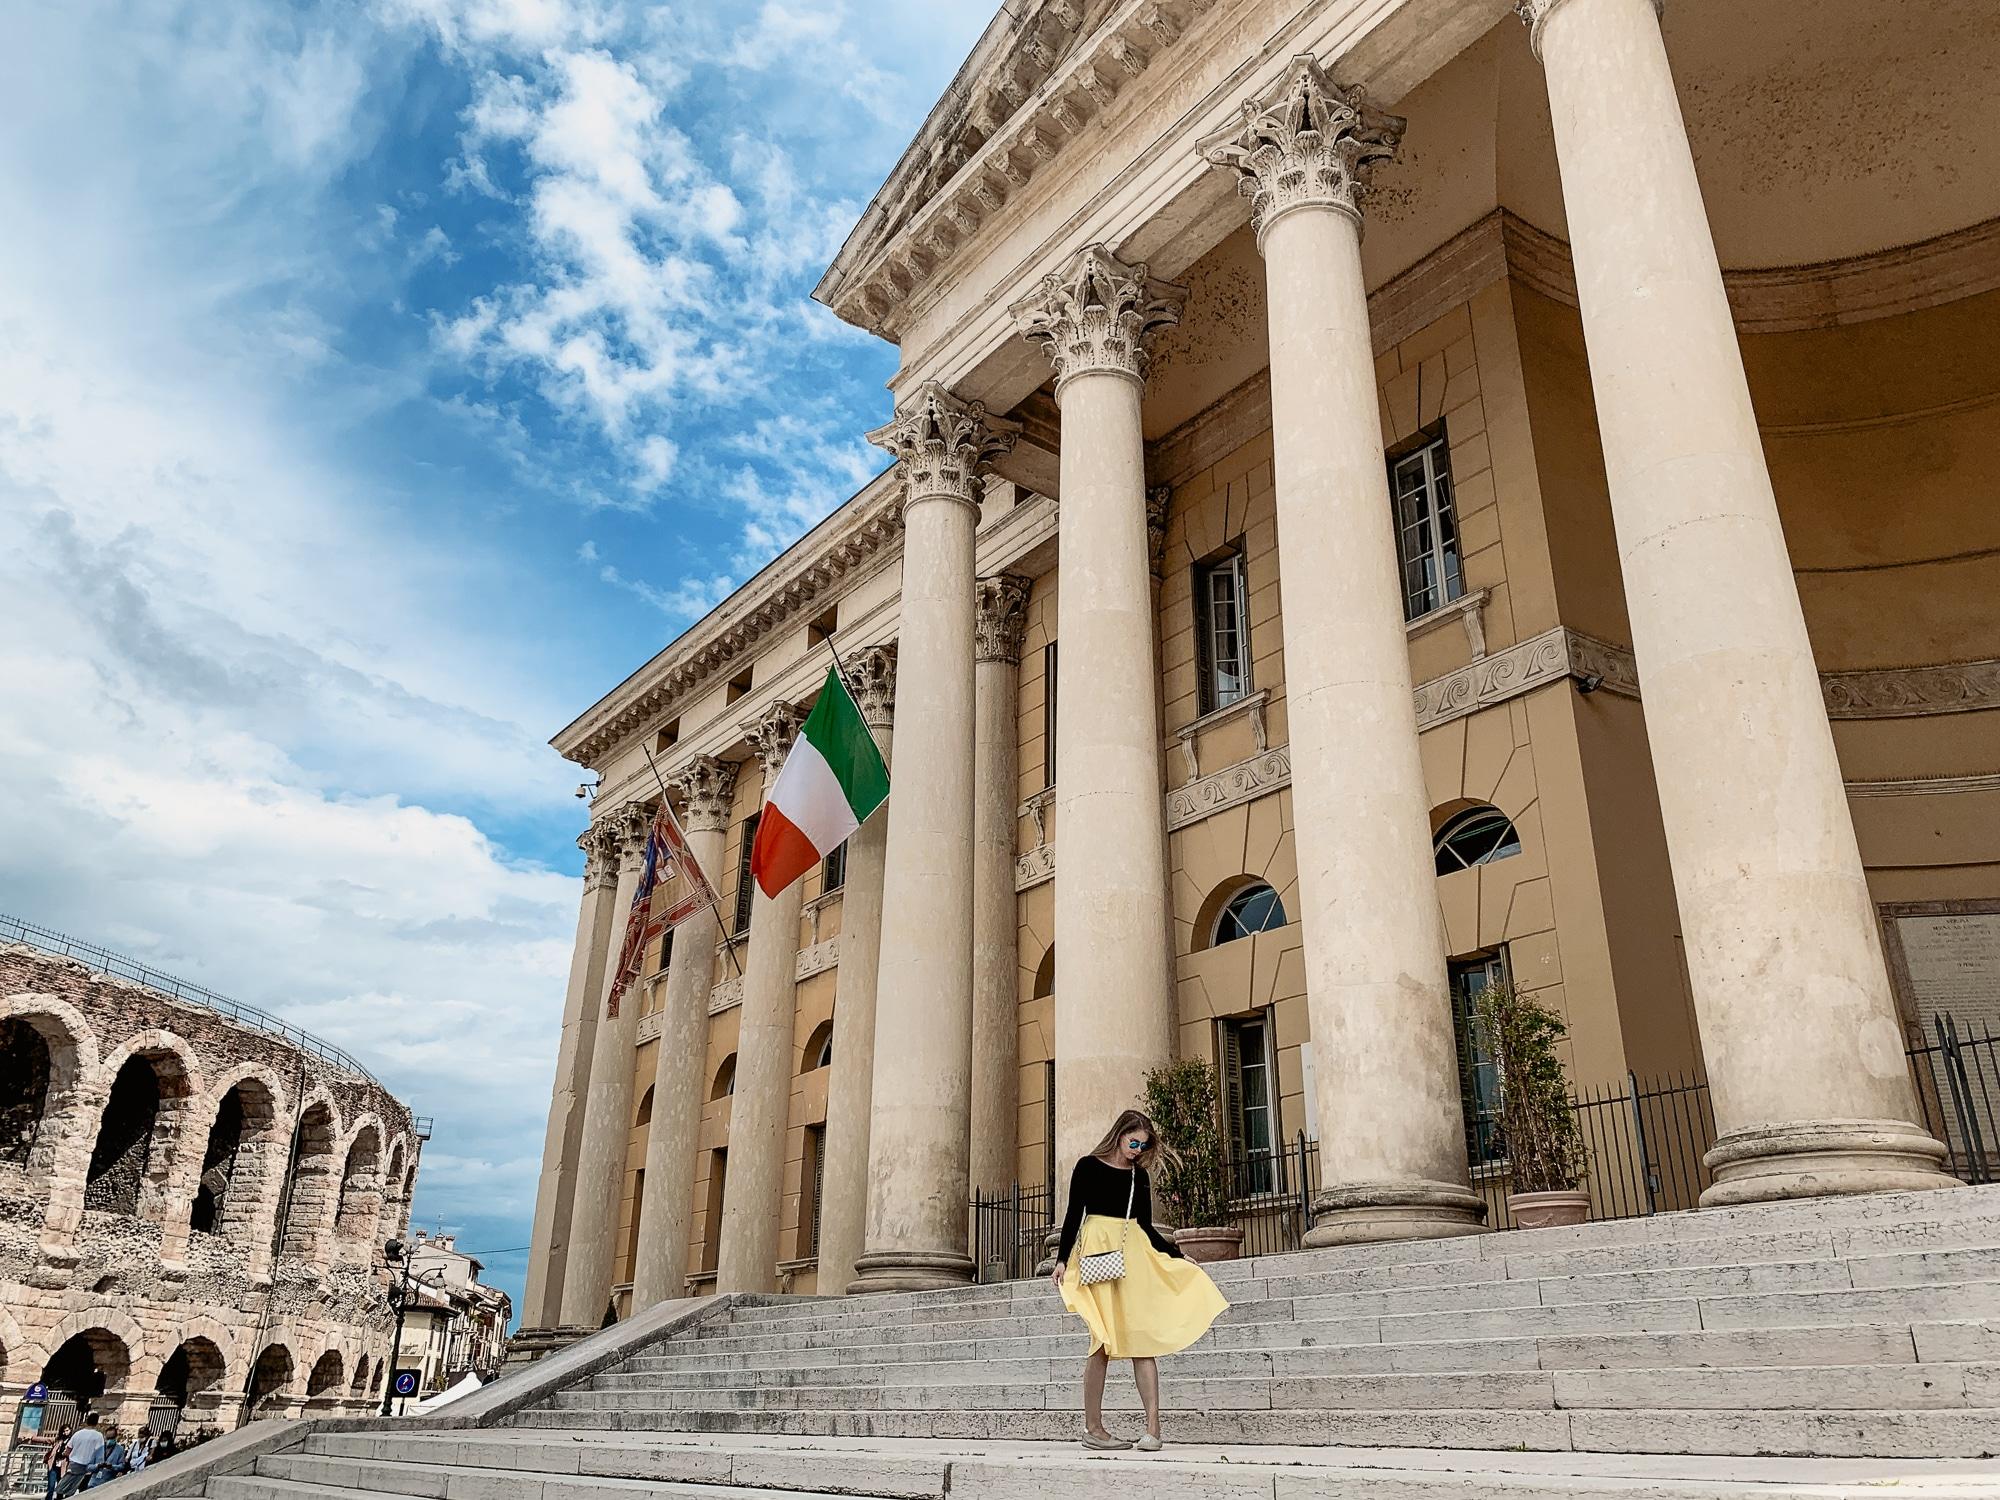 Verona Sehenswürdigkeiten - Palazzo Barbieri